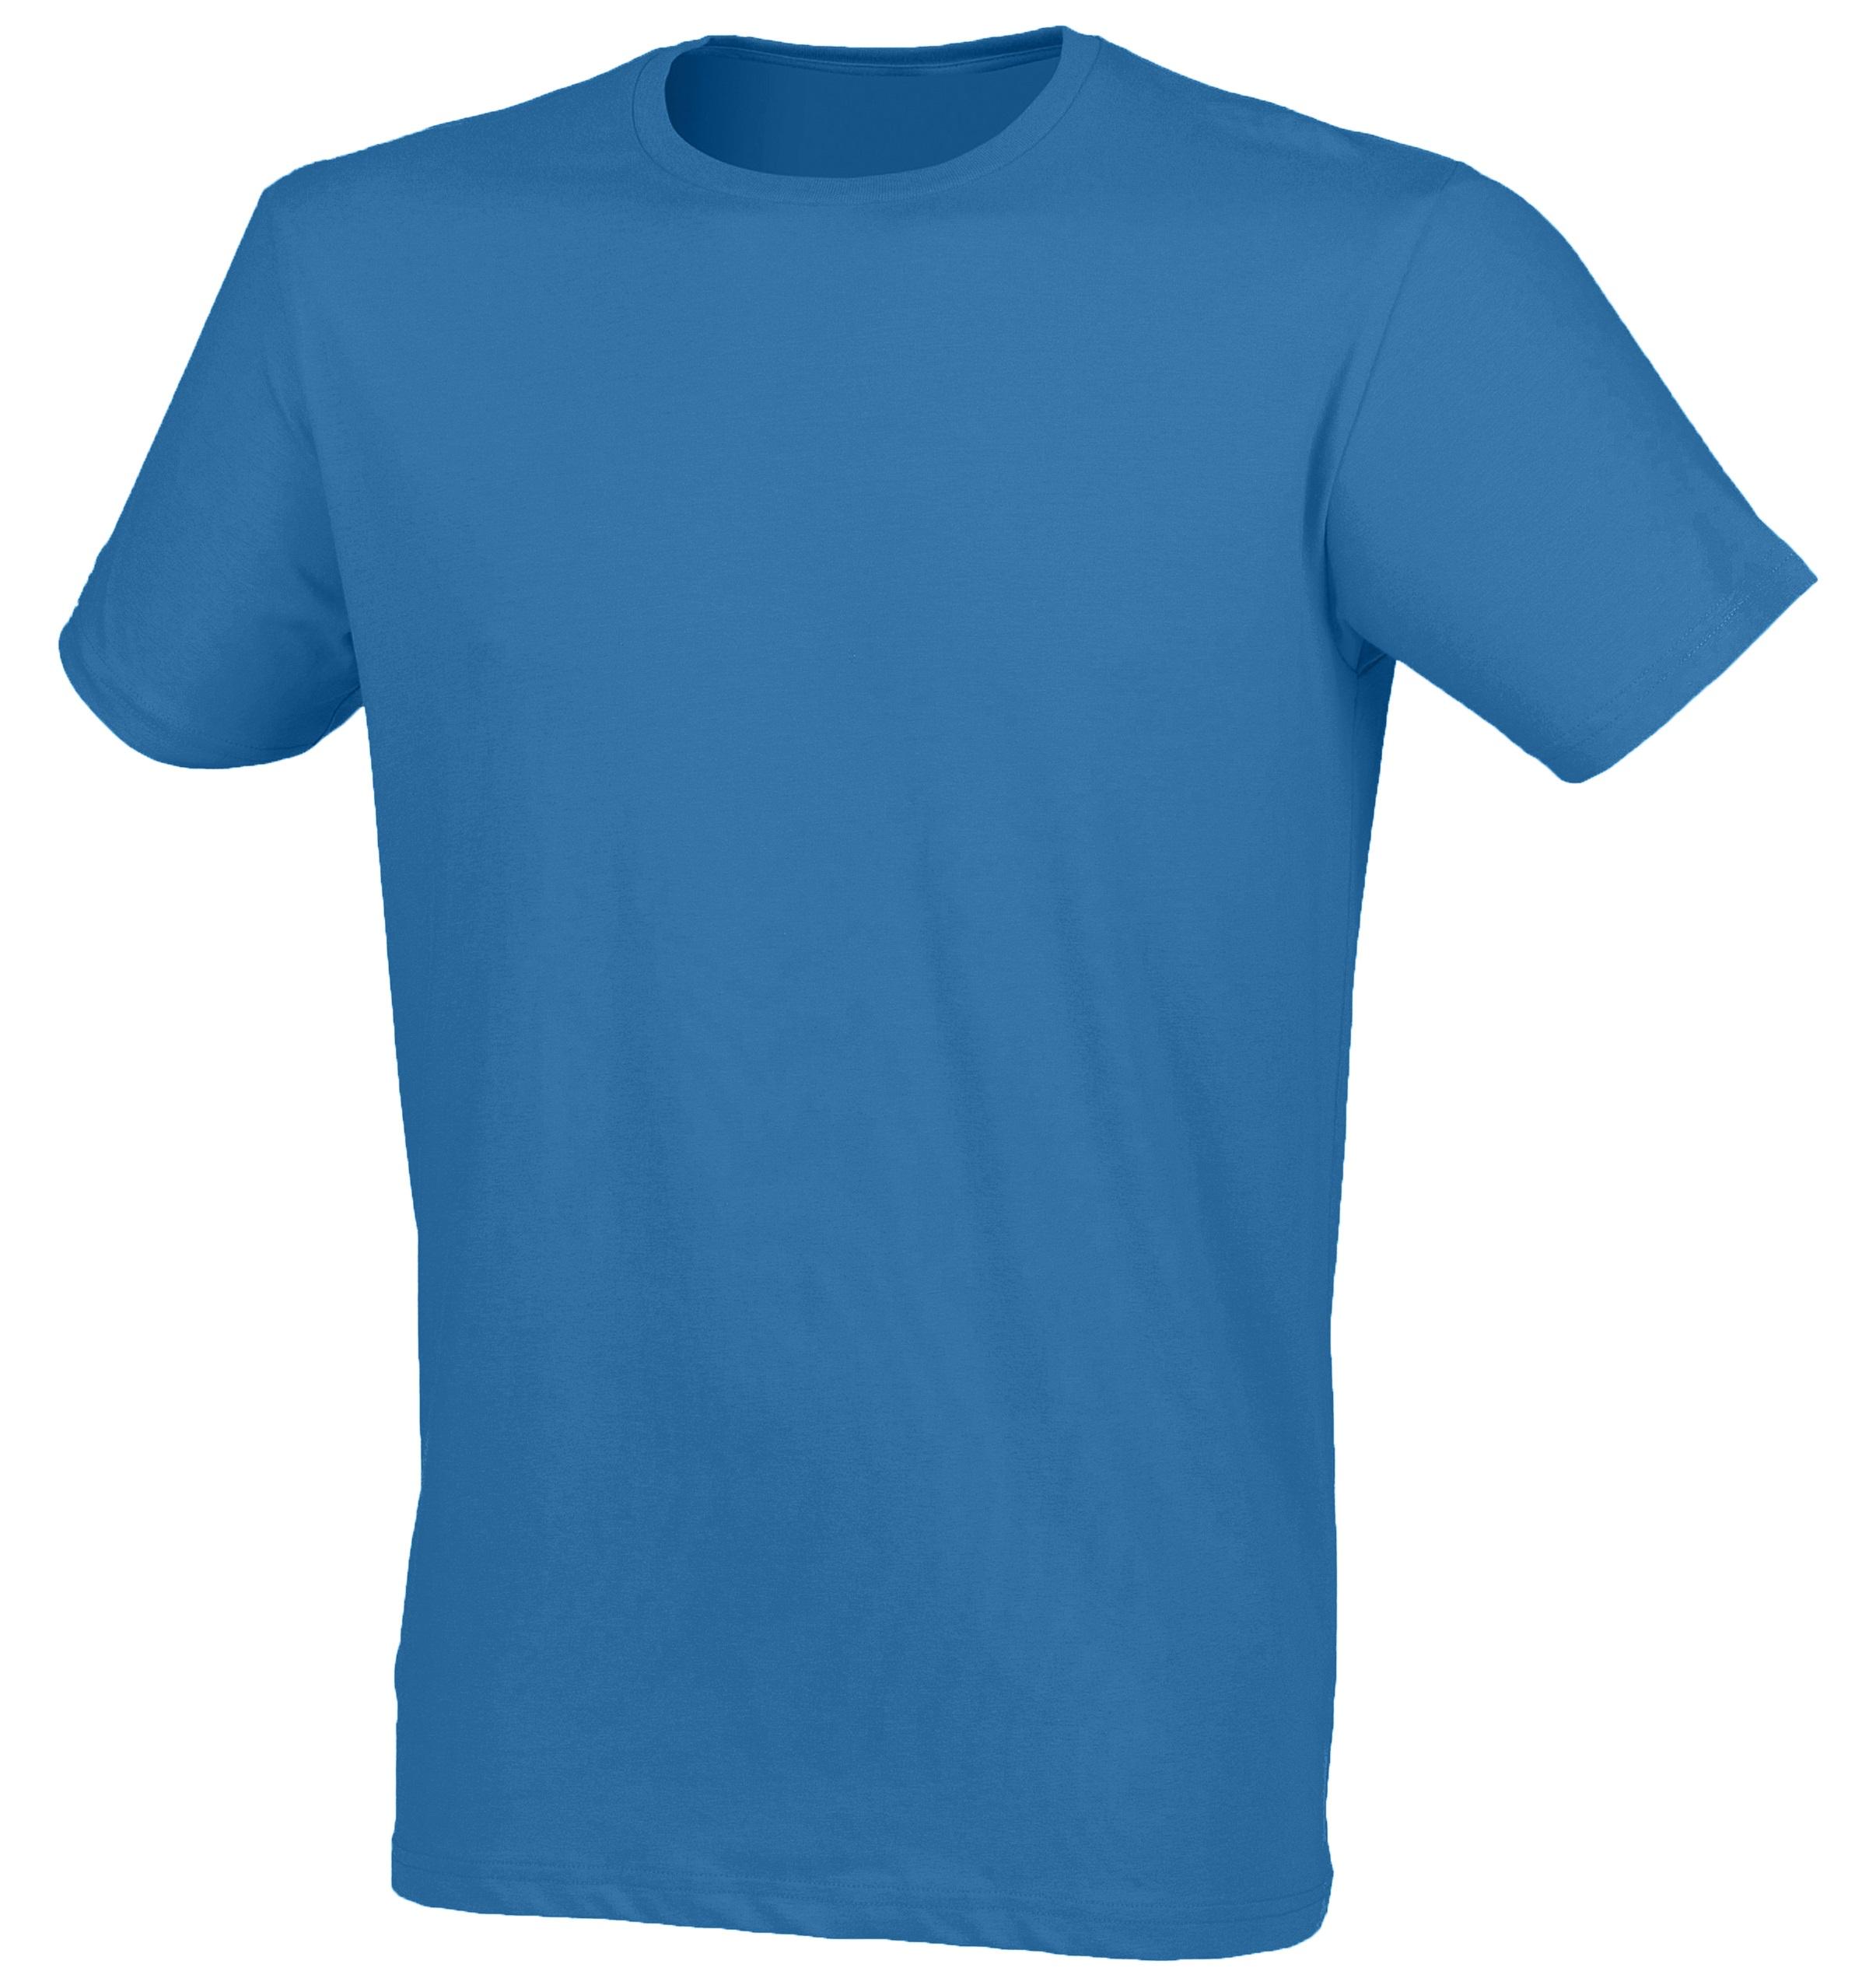 e211a8df ... Men's feel good stretch t-shirt. Return to Previous Page. prev